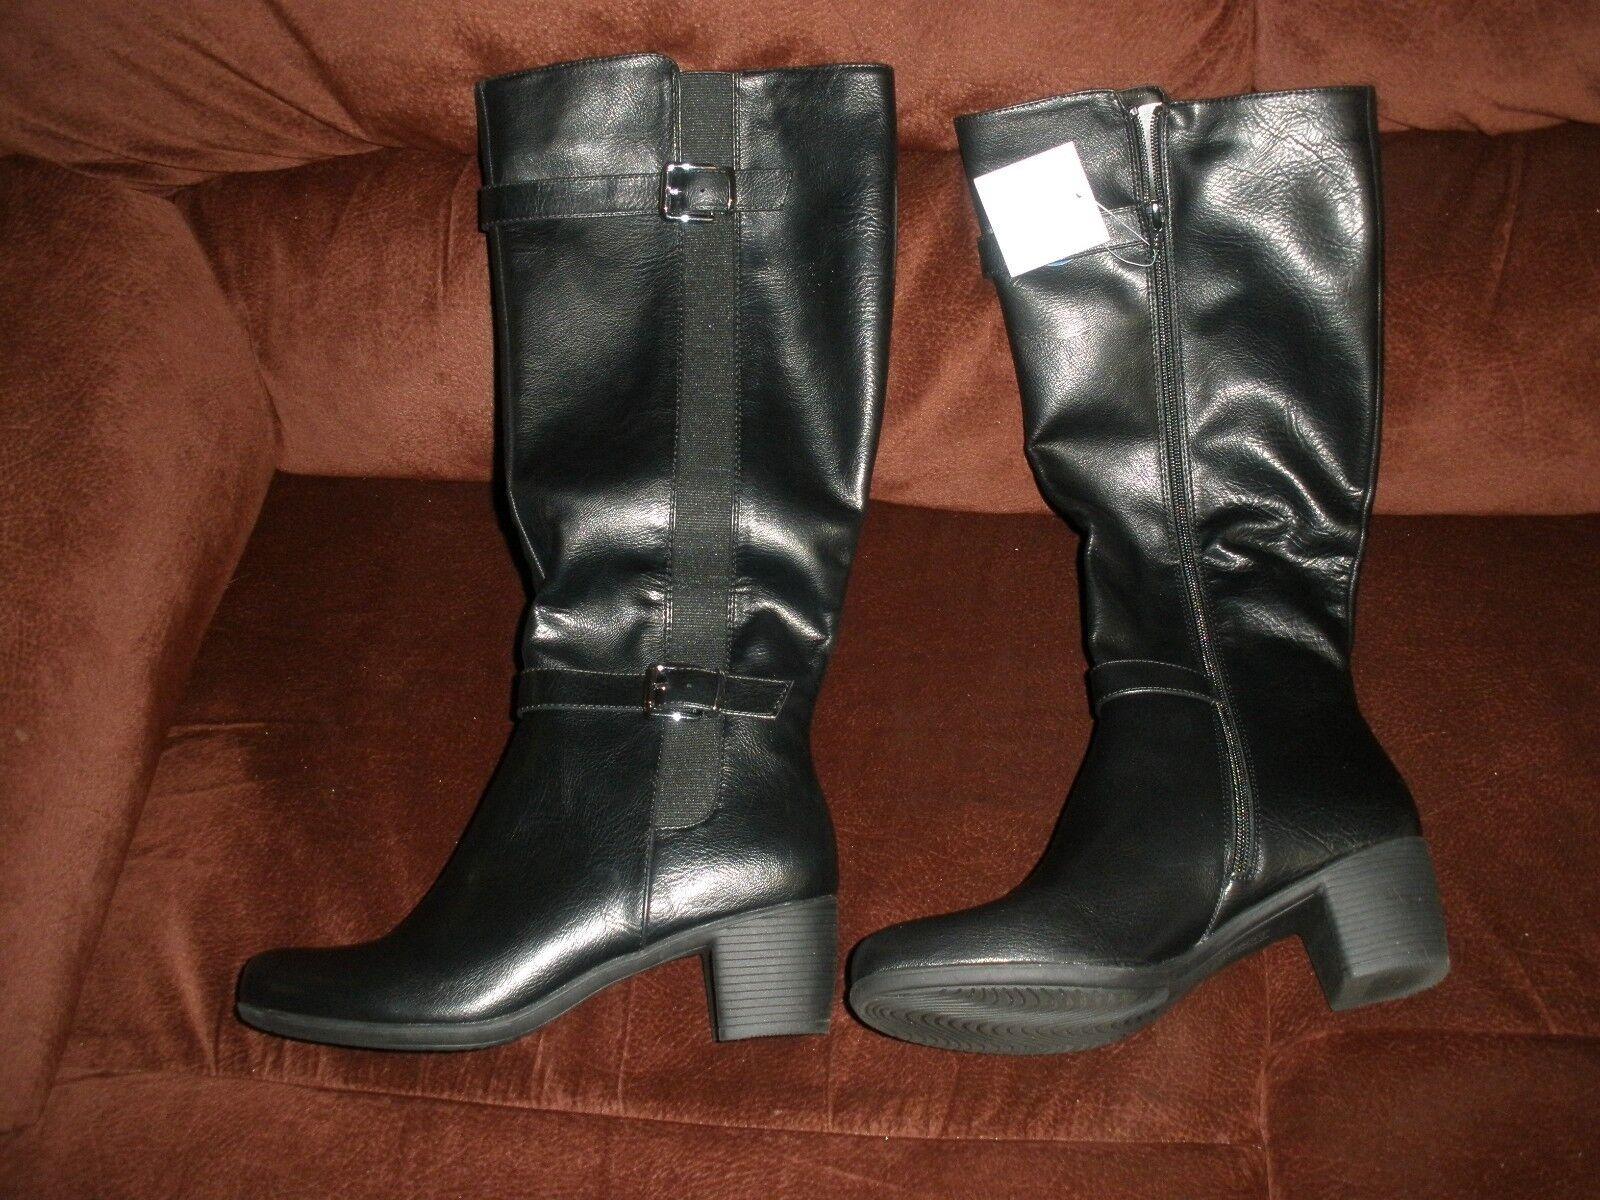 NEU CROFT & BARROW SIZE 10 WOMEN'S BOOTS BLACK CBBEV 89.99 WITH BOX